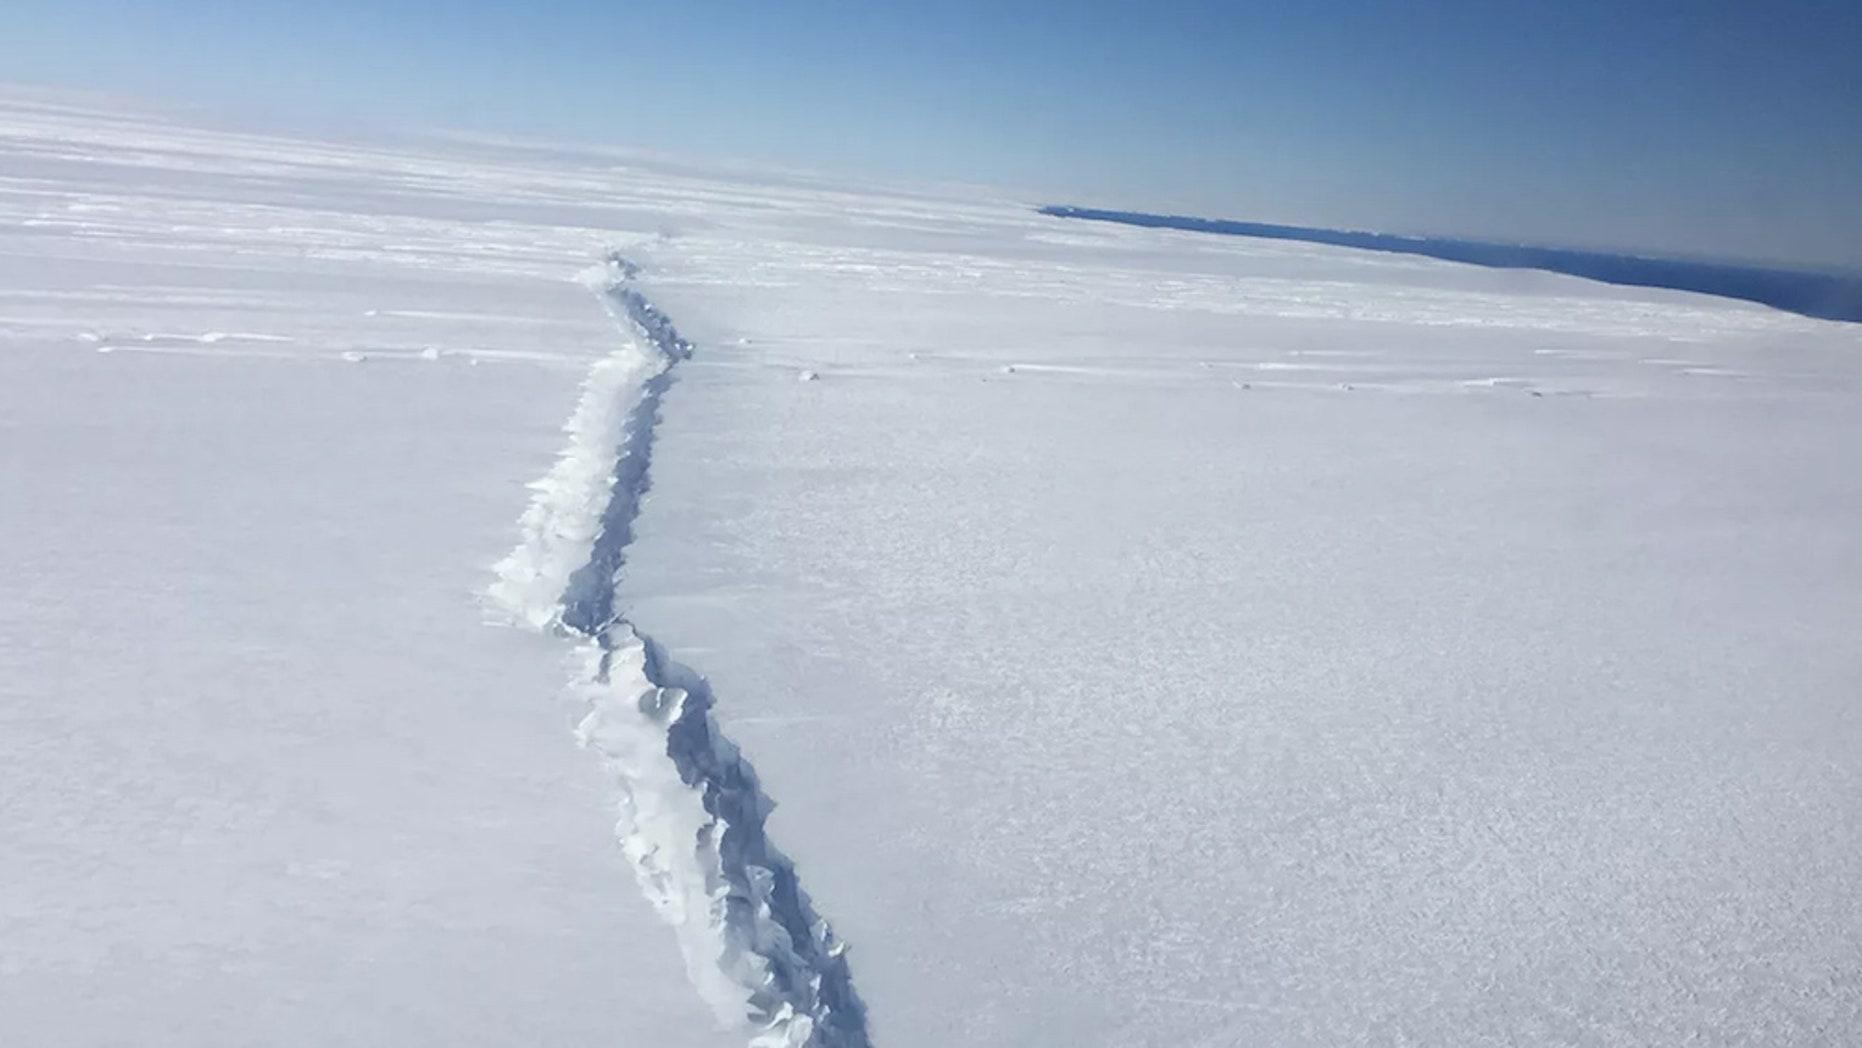 The rift along Pine Island Glacier, West Antarctica, was captured during an IceBridge flight on Nov. 4, 2016.